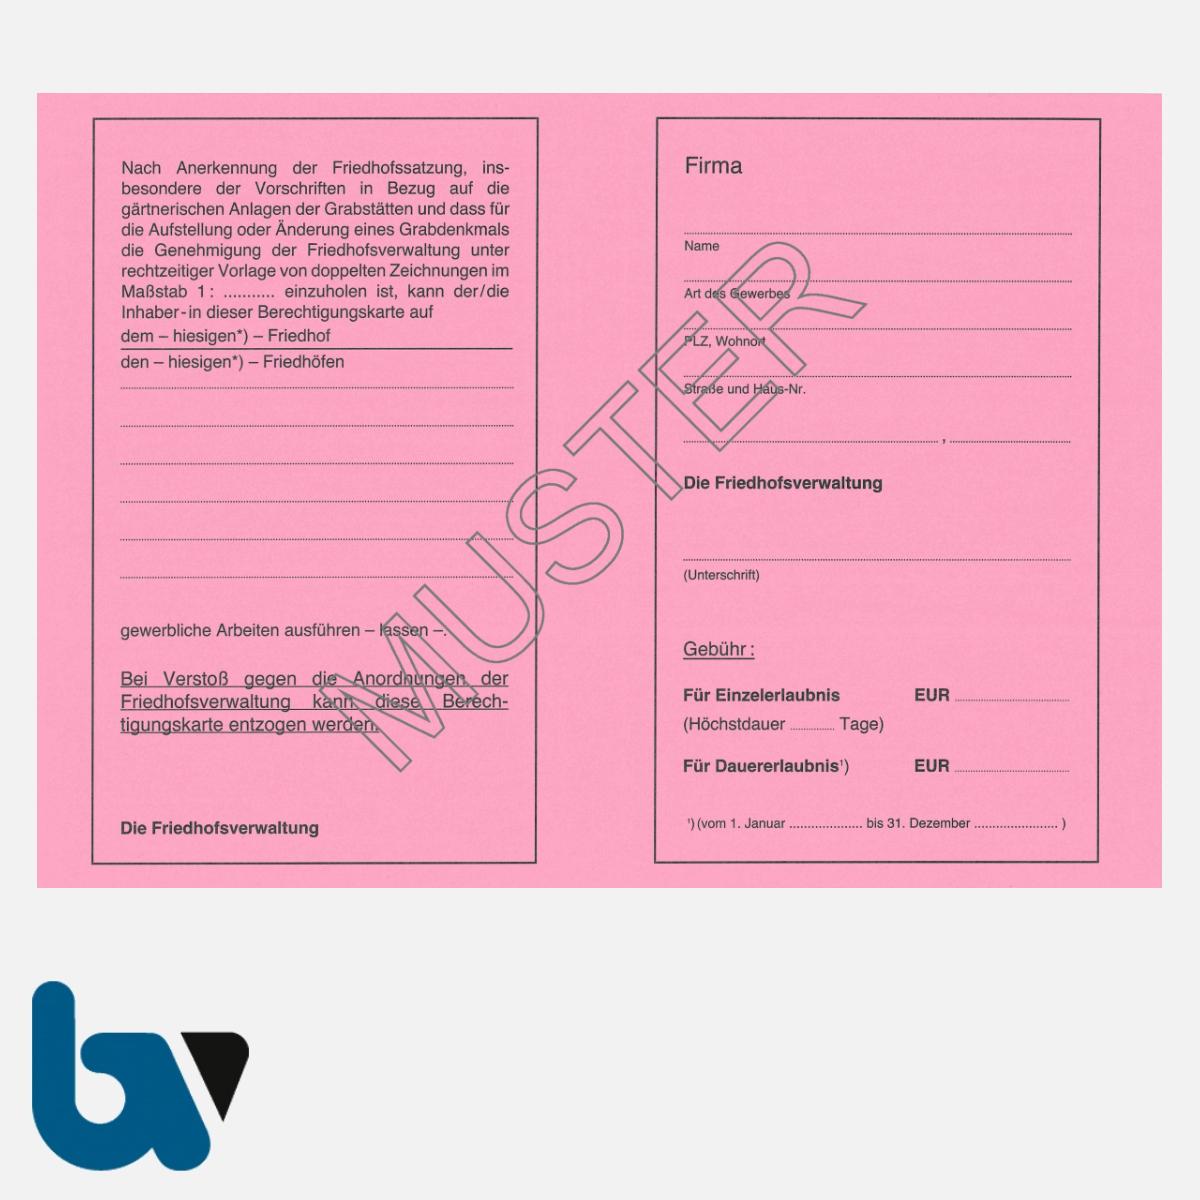 0/151-3 Berechtigungs Ausweis Ausführung Gewerblich Arbeiten Friedhof Friedhöfe Verwaltung Neobond rosa DIN A5 A6 Rückseite | Borgard Verlag GmbH